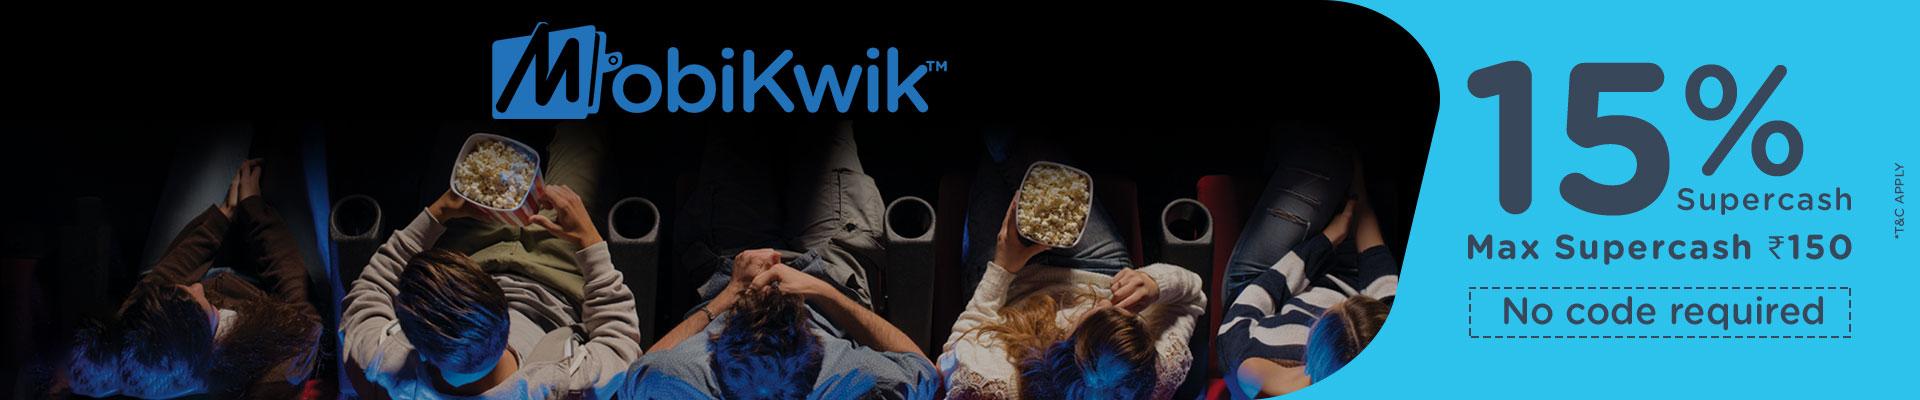 Mobikwik April Banner